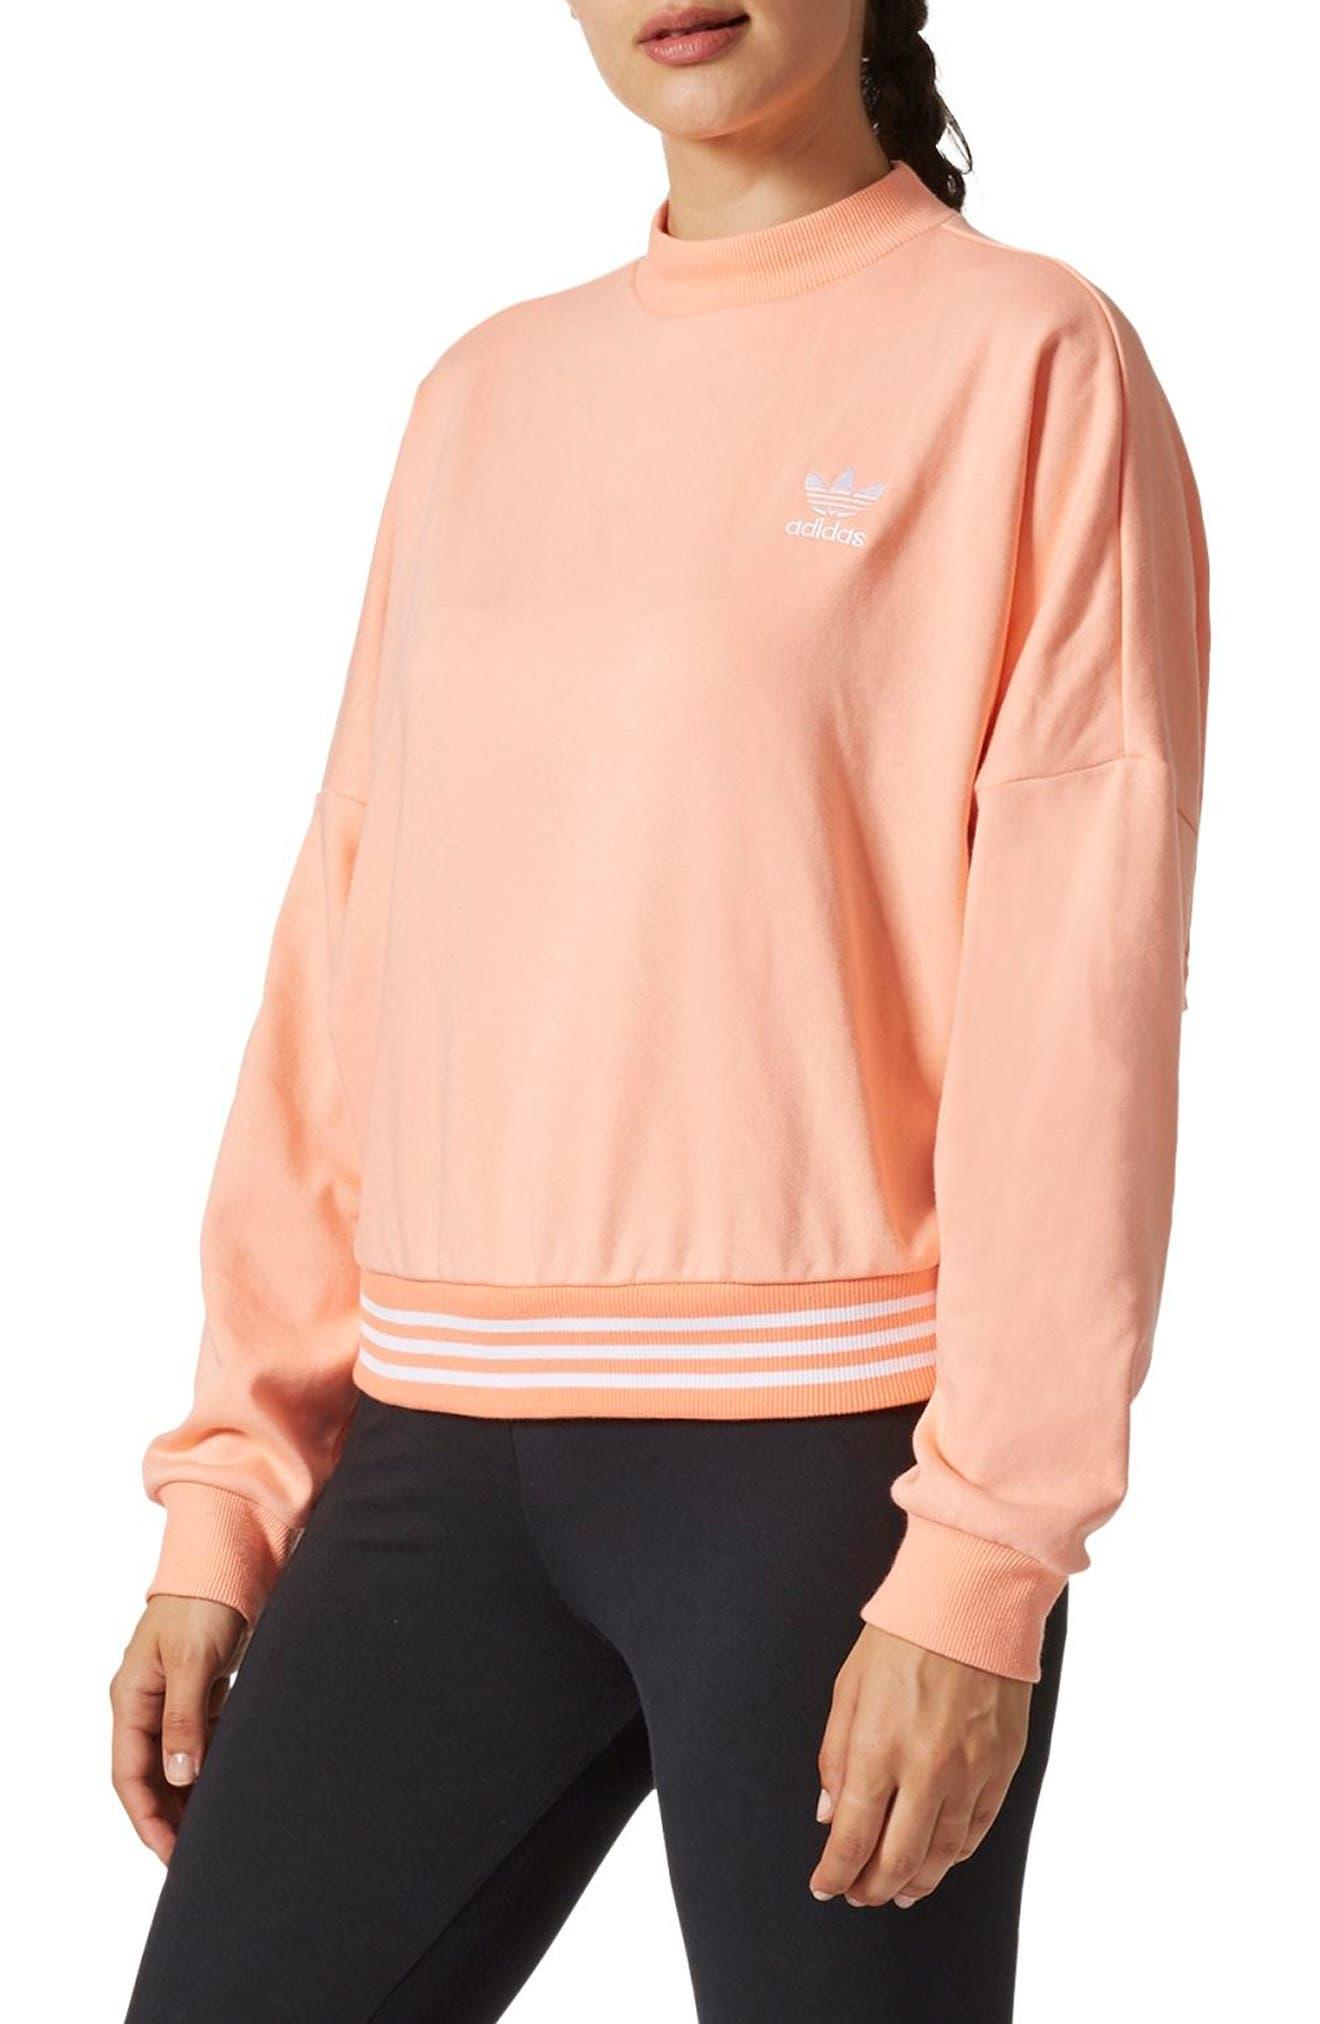 Originals by Pharrell Williams HU Sweater,                         Main,                         color, 950